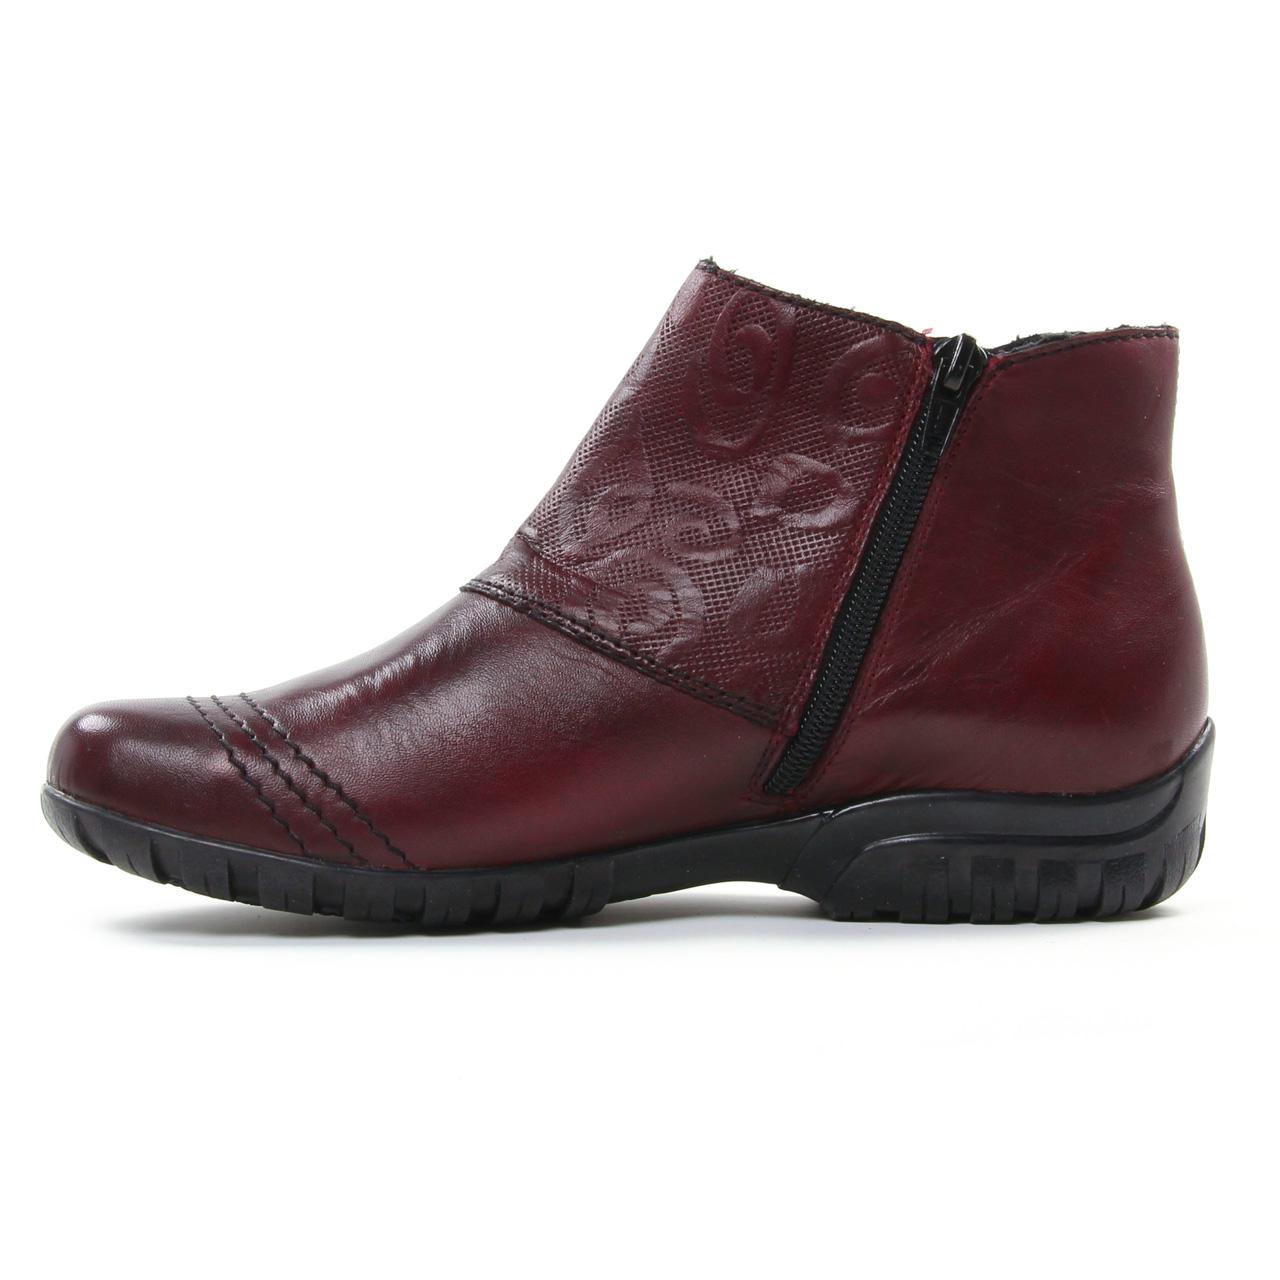 chaussures rieker bottine femme